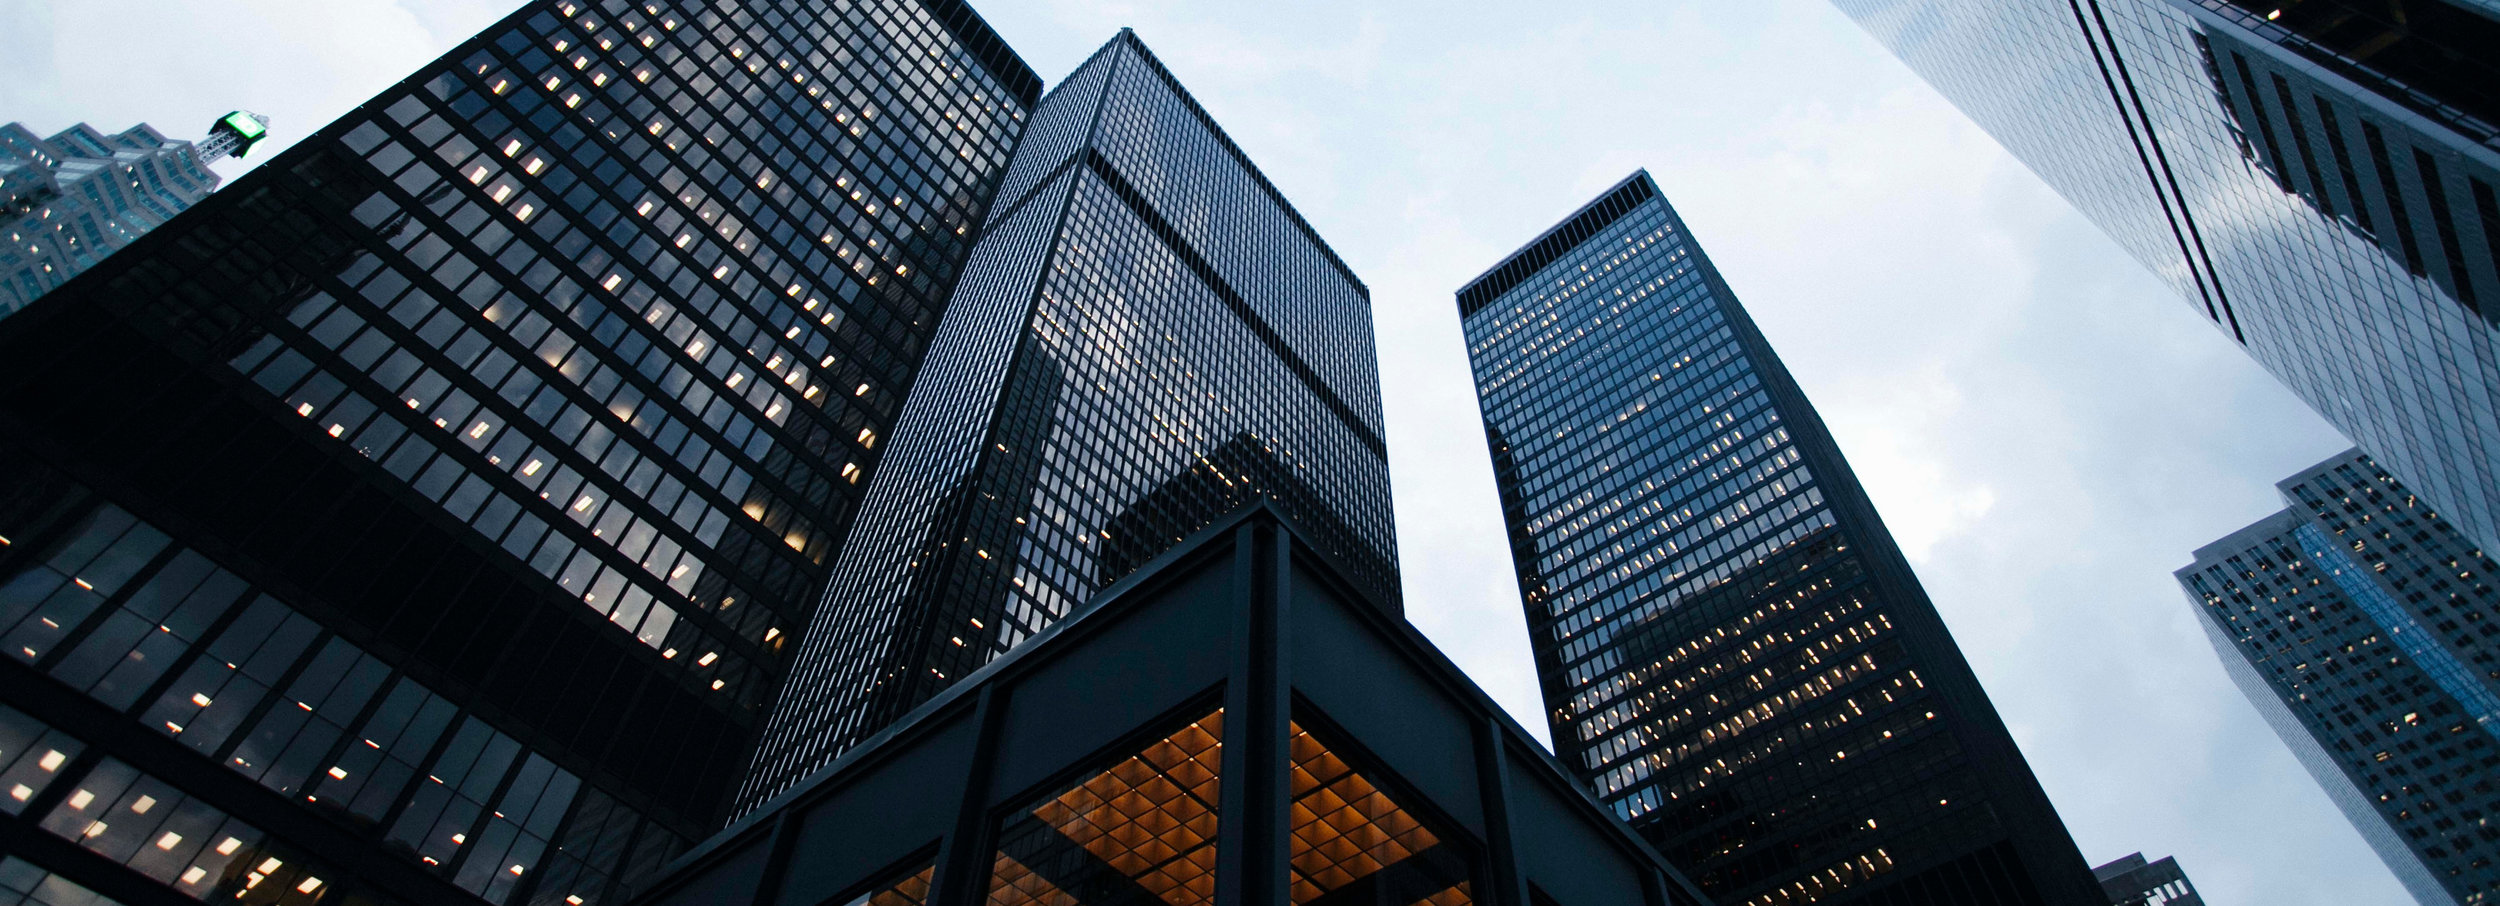 Expert Witnesses + Financial Capital = An Outstanding Partnership